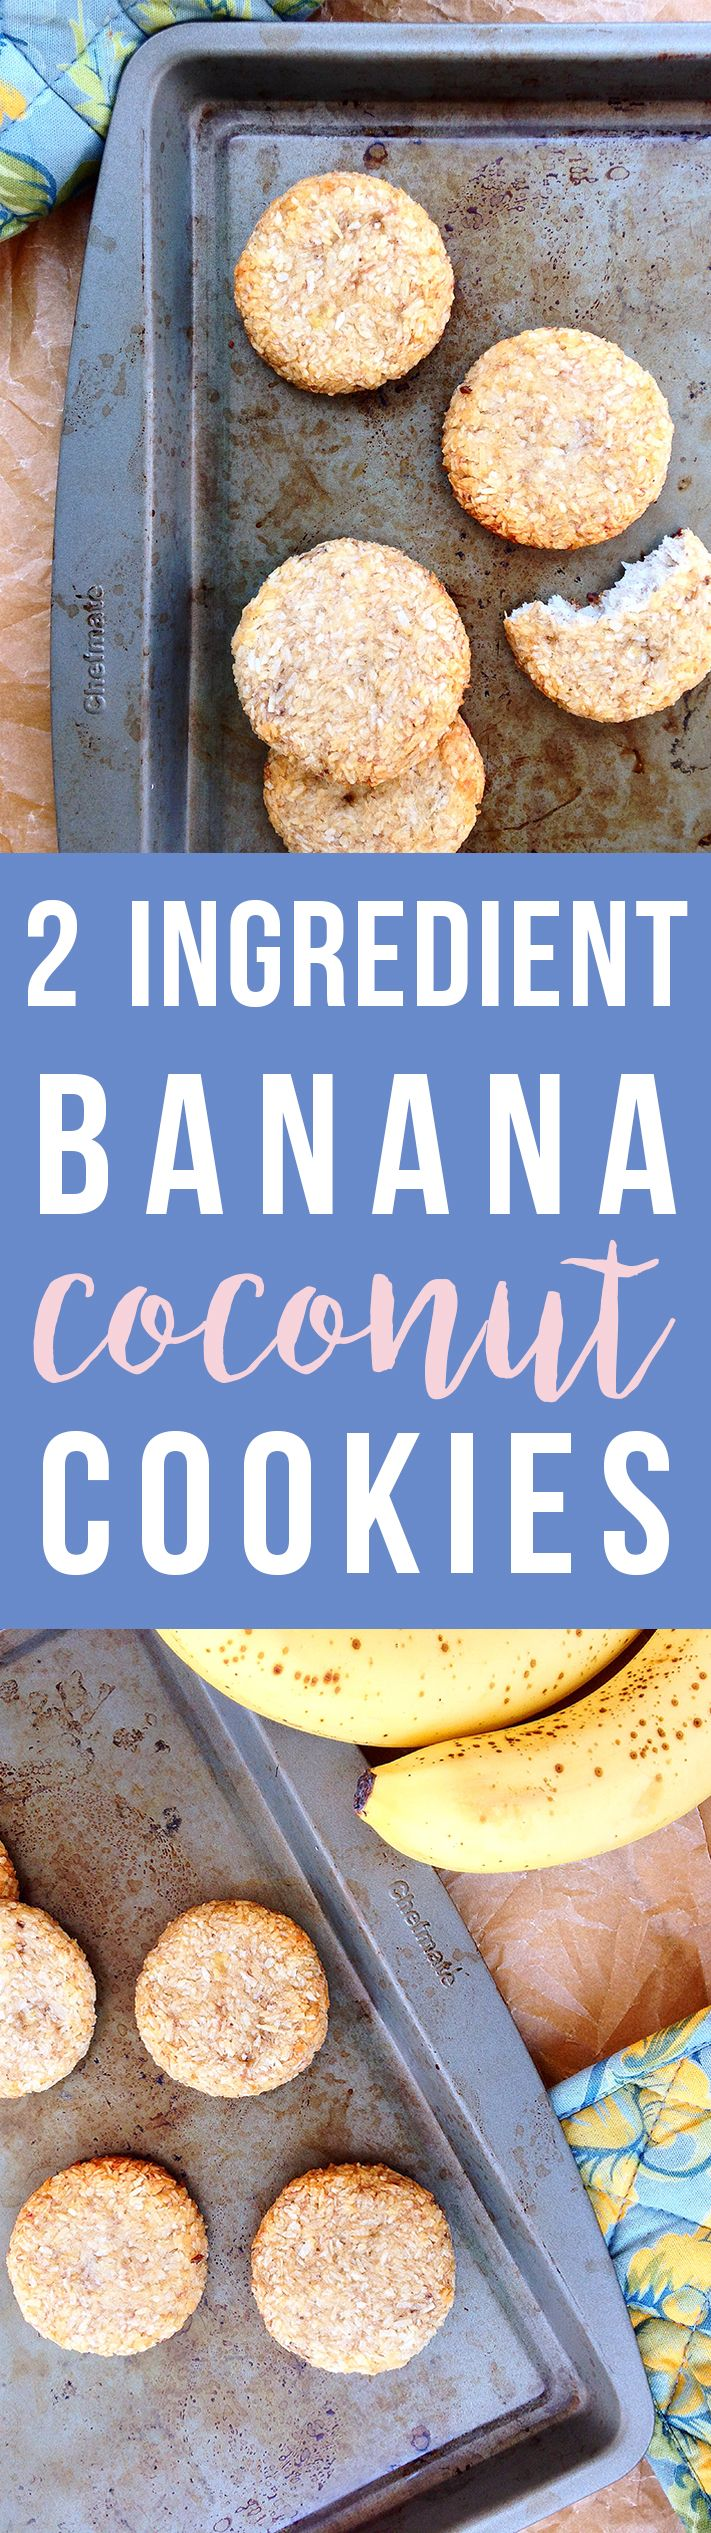 Food processor oatmeal cookie recipes